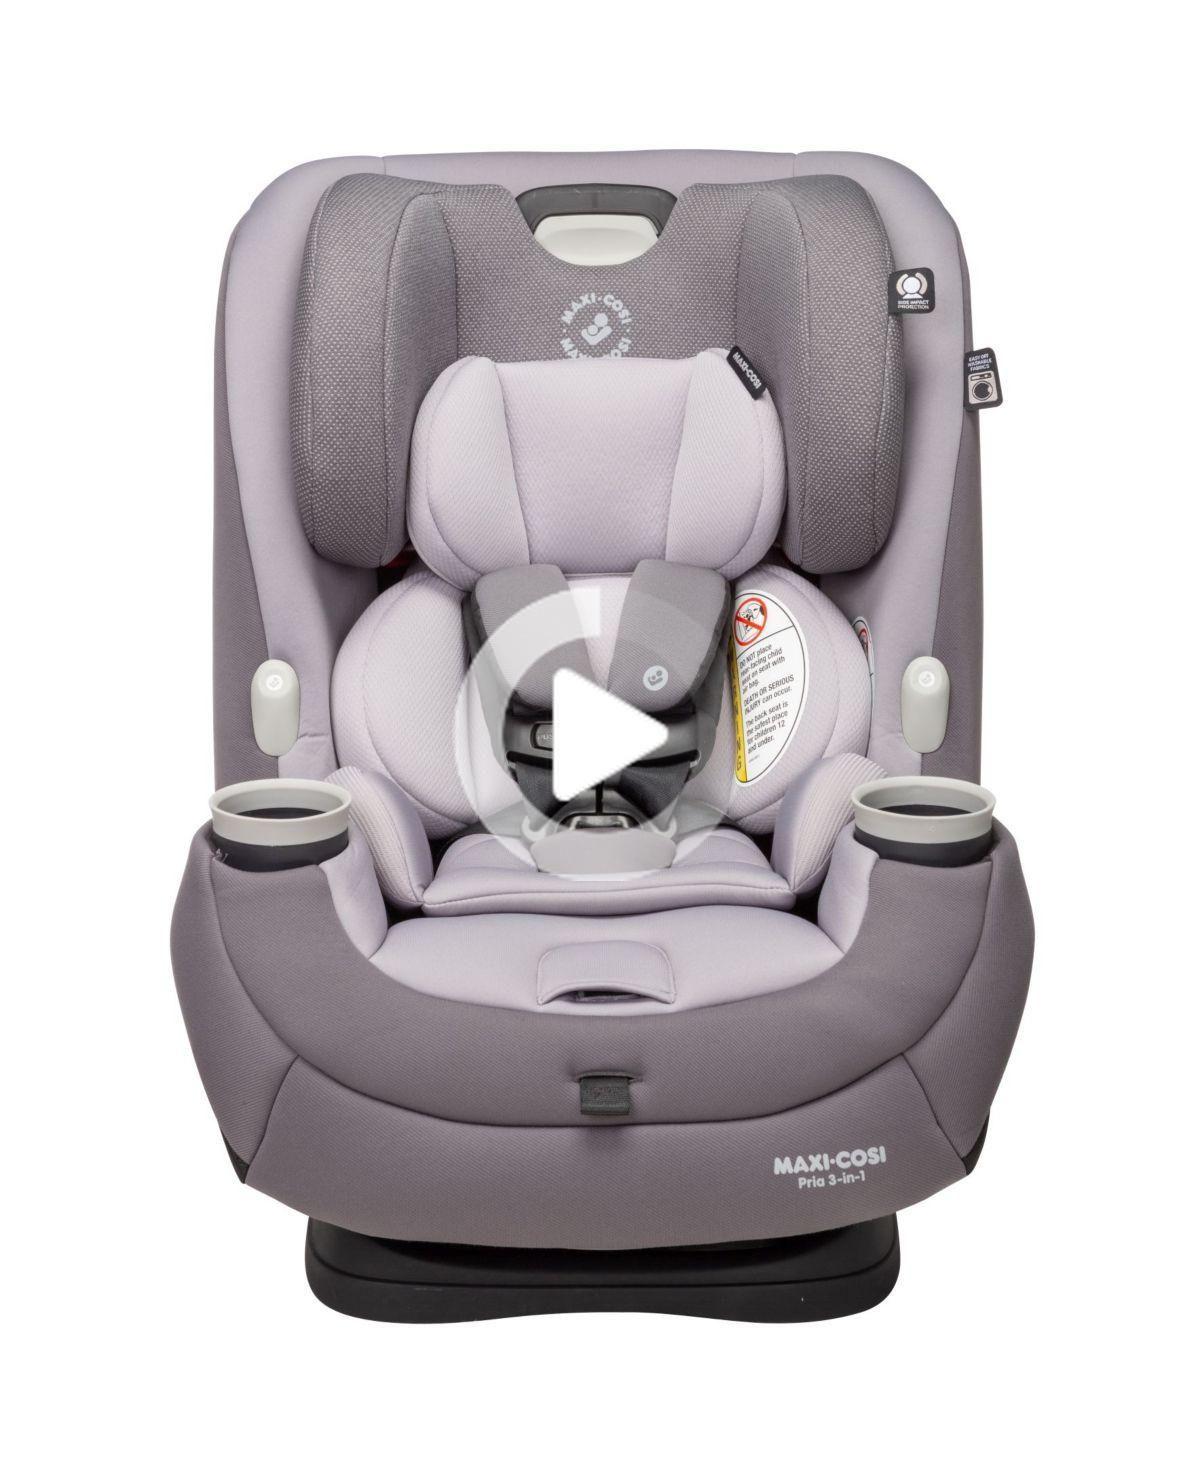 Maxi Cosi MaxiCosi® Pria 3in1 Car Seat Reviews All